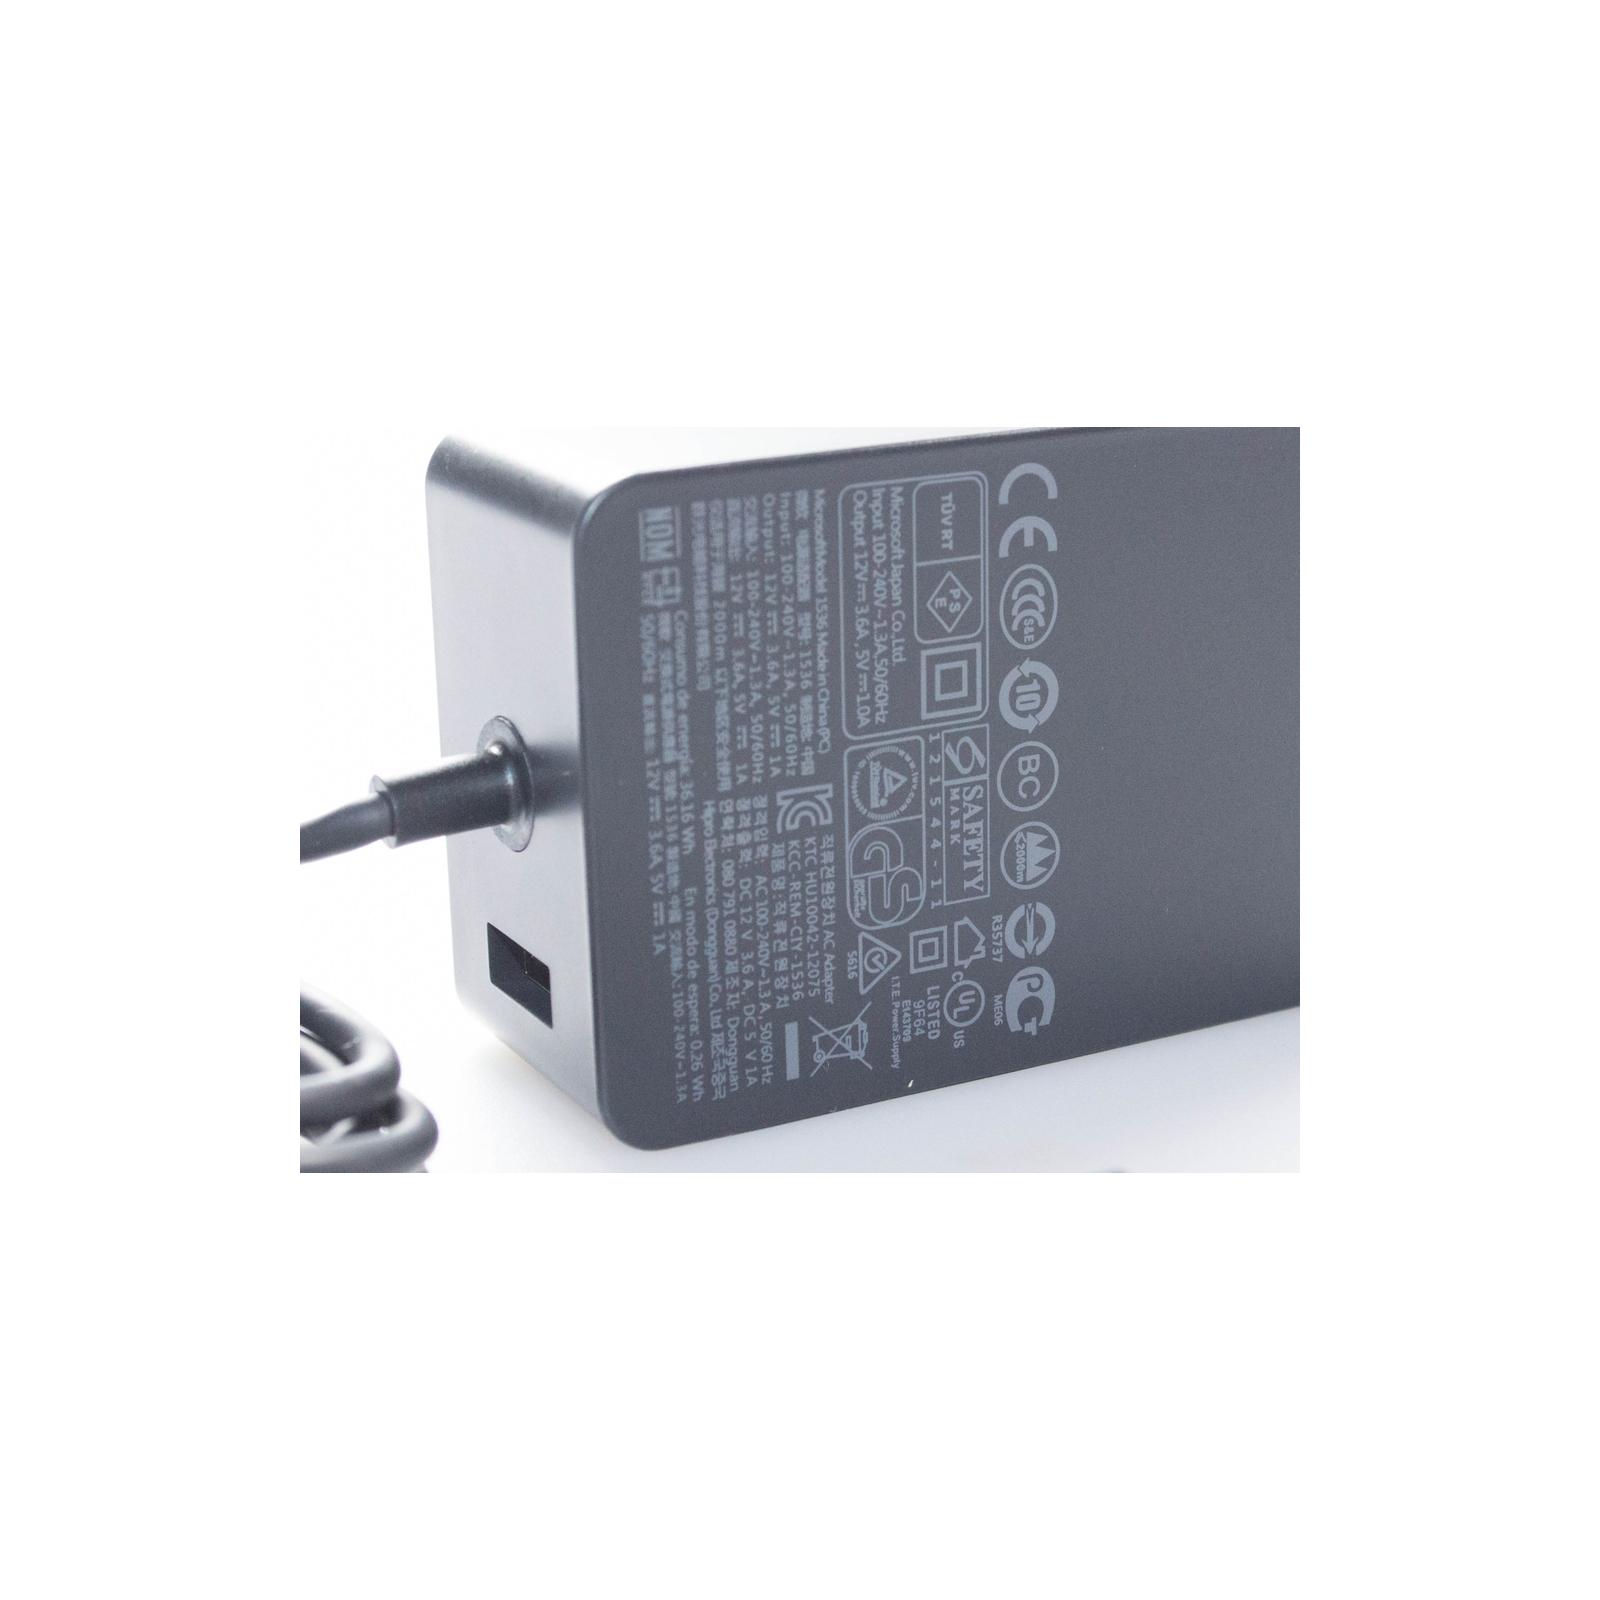 Блок питания для планшета Microsoft 43W 12В, 3.6А, разъем 5-pin special + USB (model 1536 / A40218) изображение 4